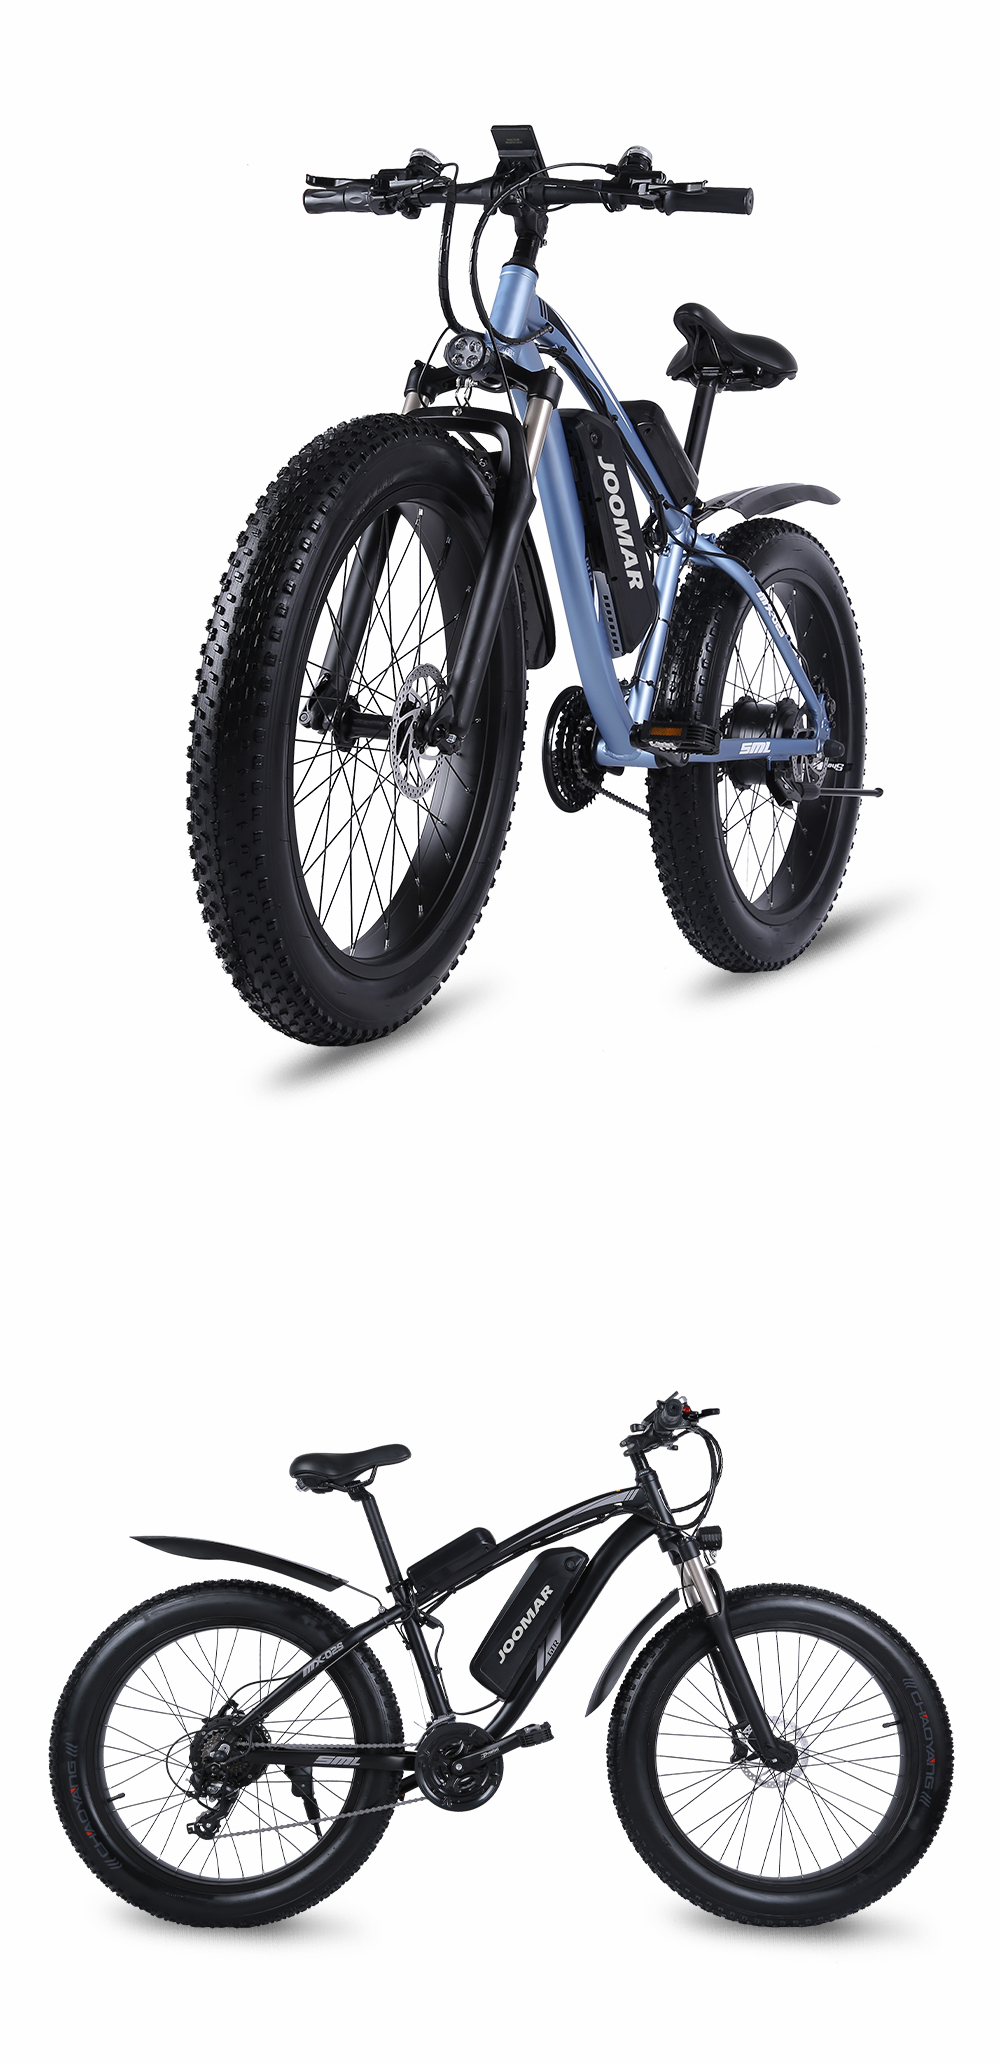 JOOMAR 1000W Electric Bike Fat Tire Ebike 26inch Top Aluminum Alloy Outdoor Beach Mountain Bike Snow Bicycle Cycling JM02S Plus